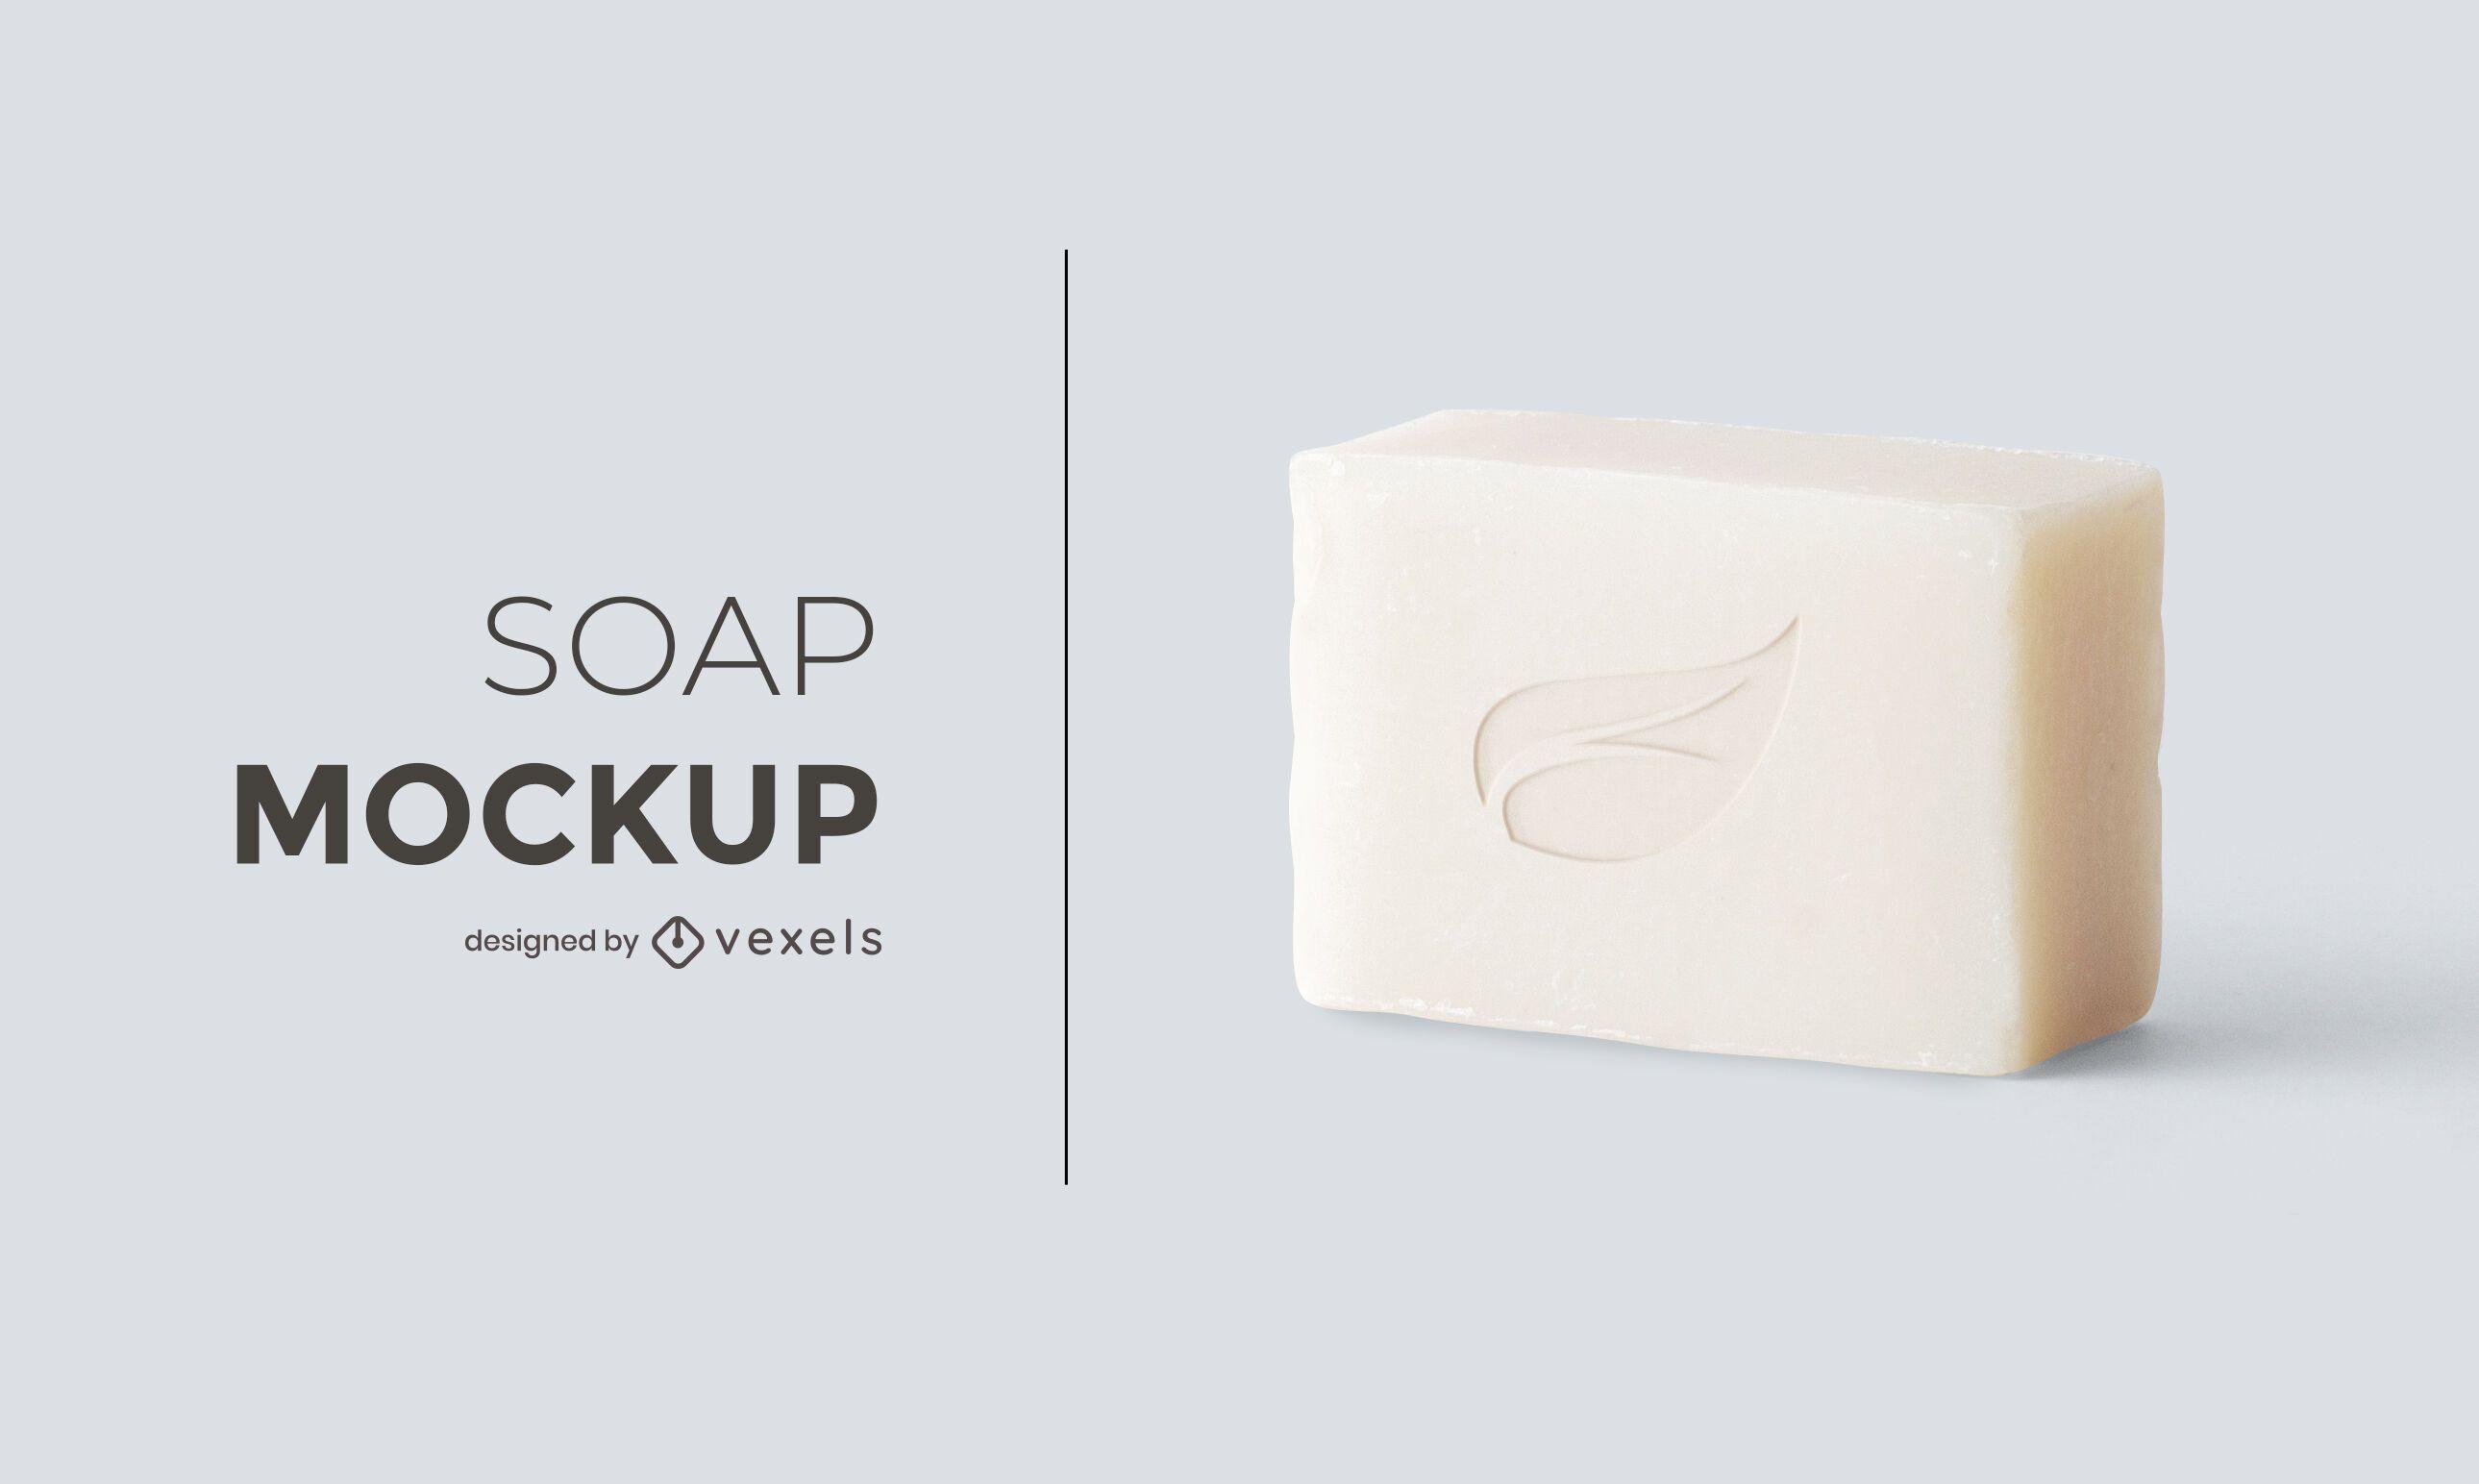 Soap bar mockup design